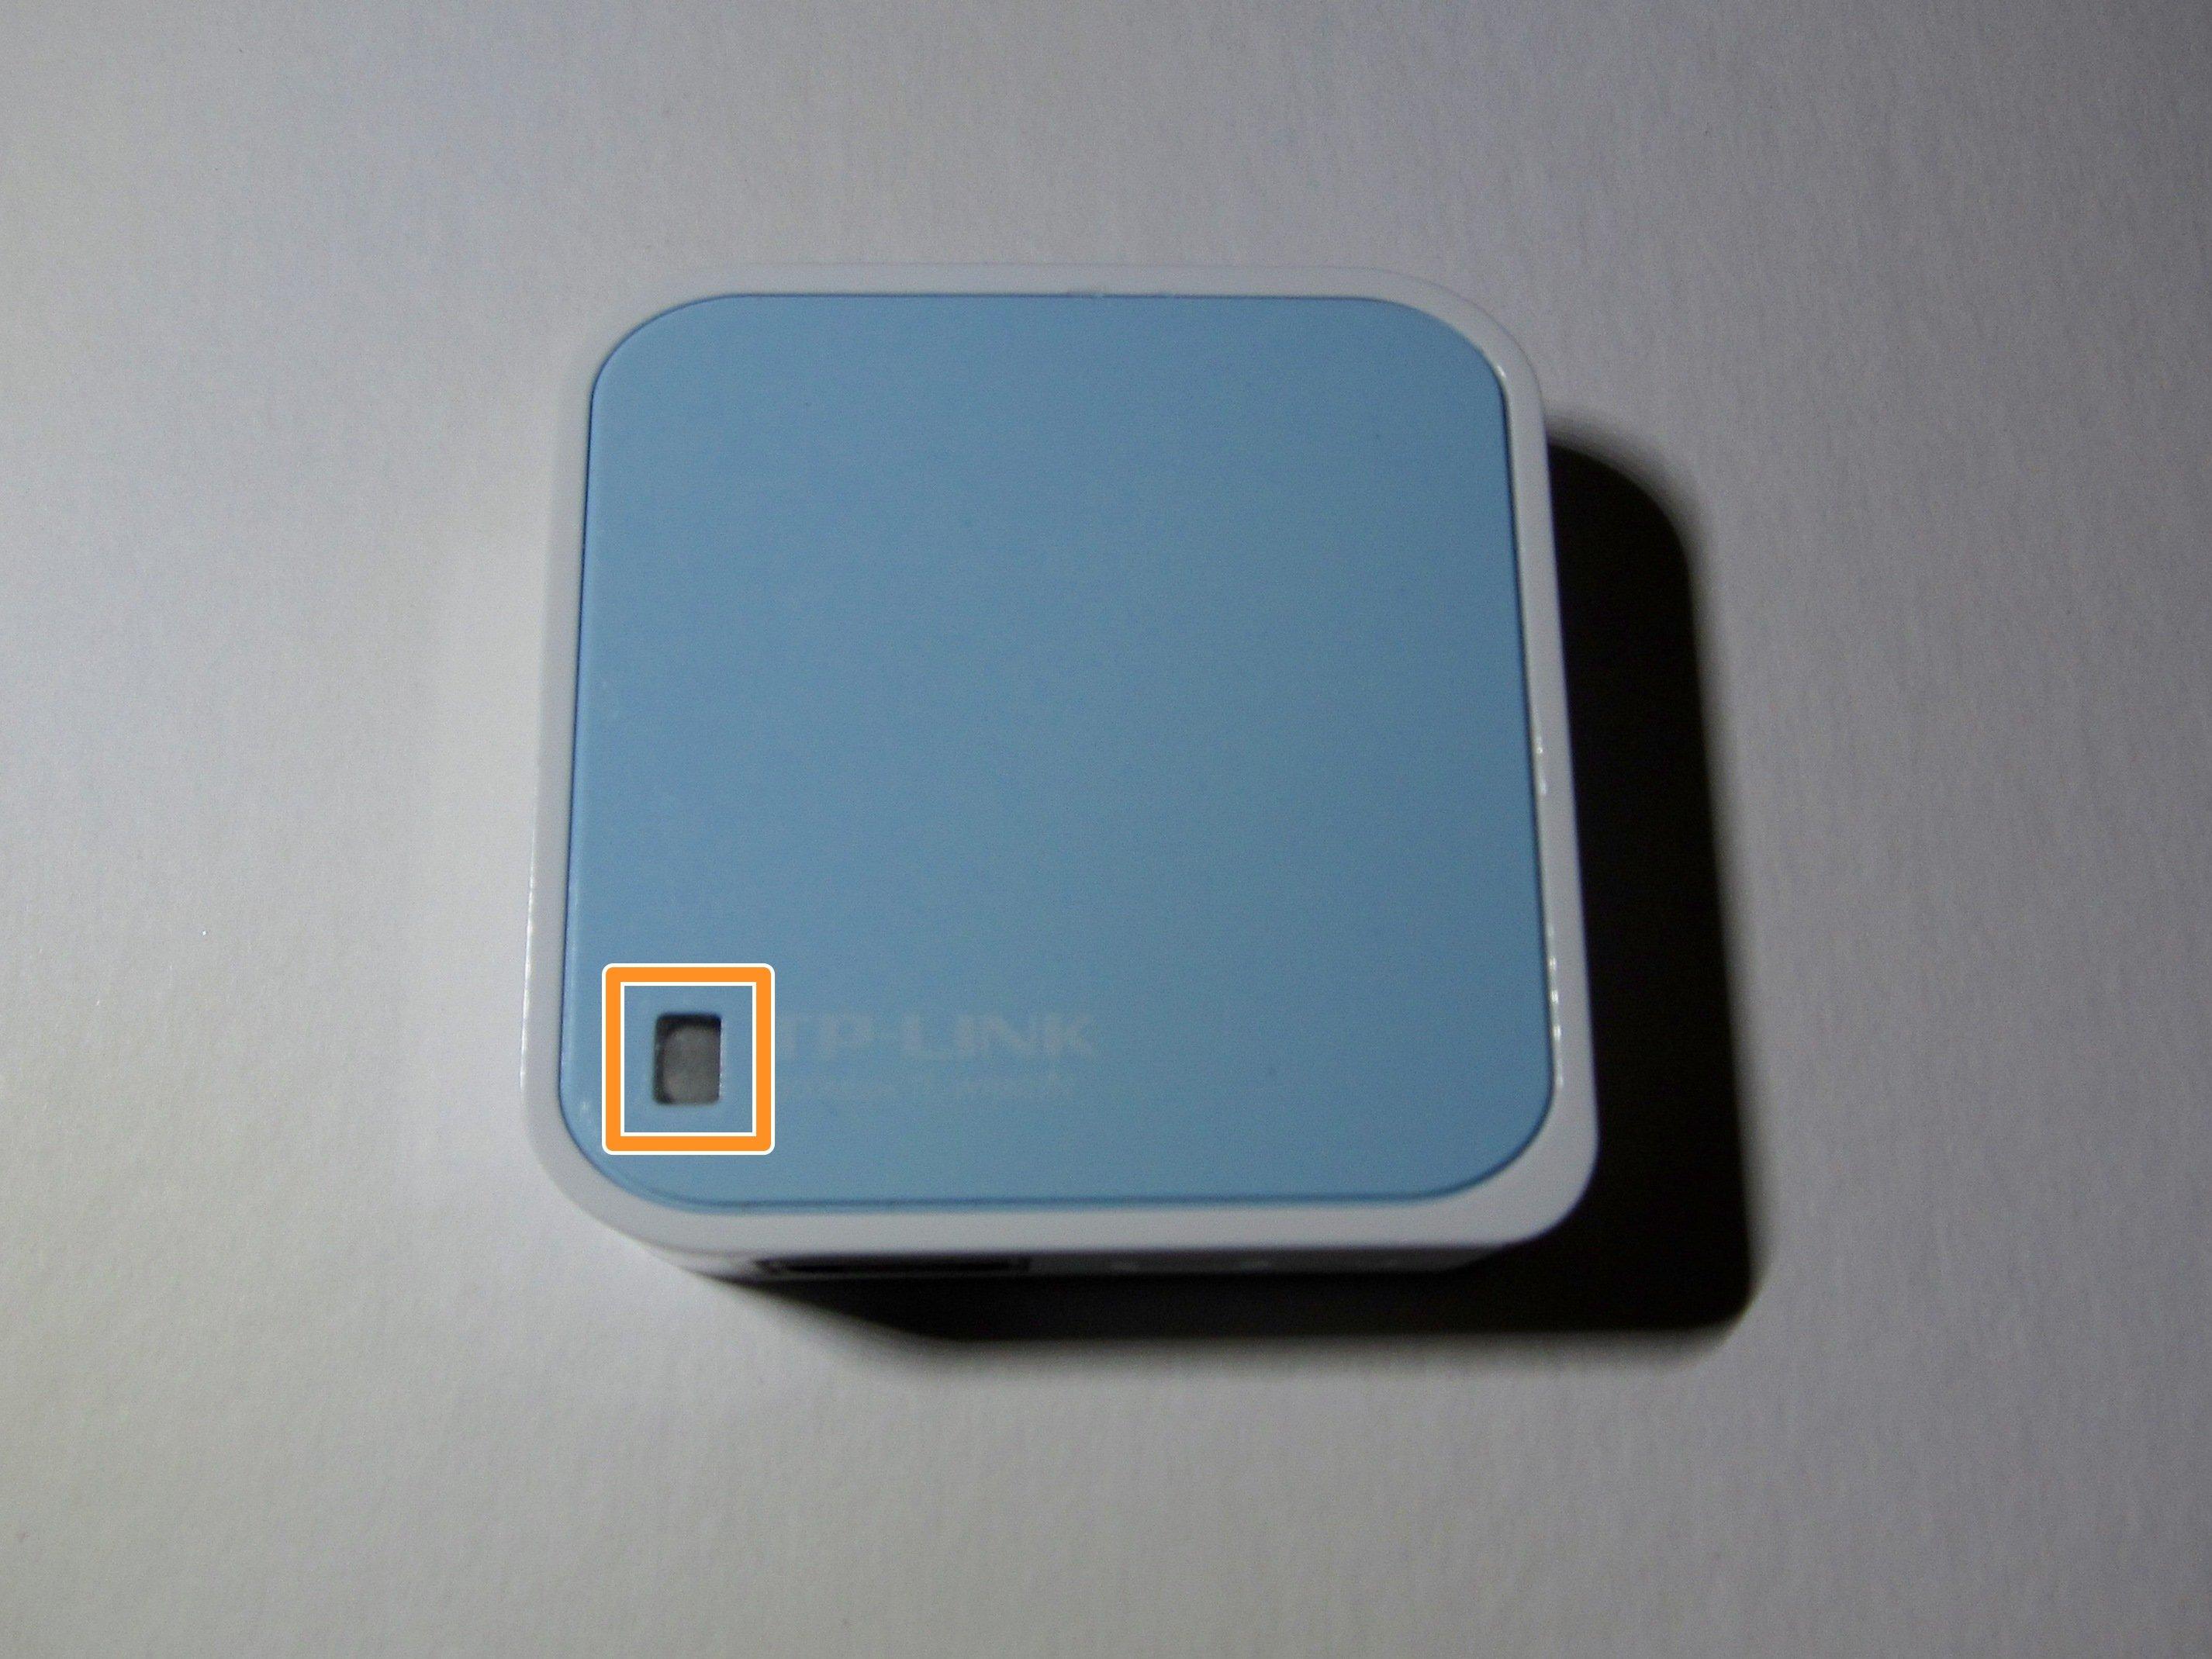 TP-Link TL-WR802N N300 Nano Router Teardown - iFixit